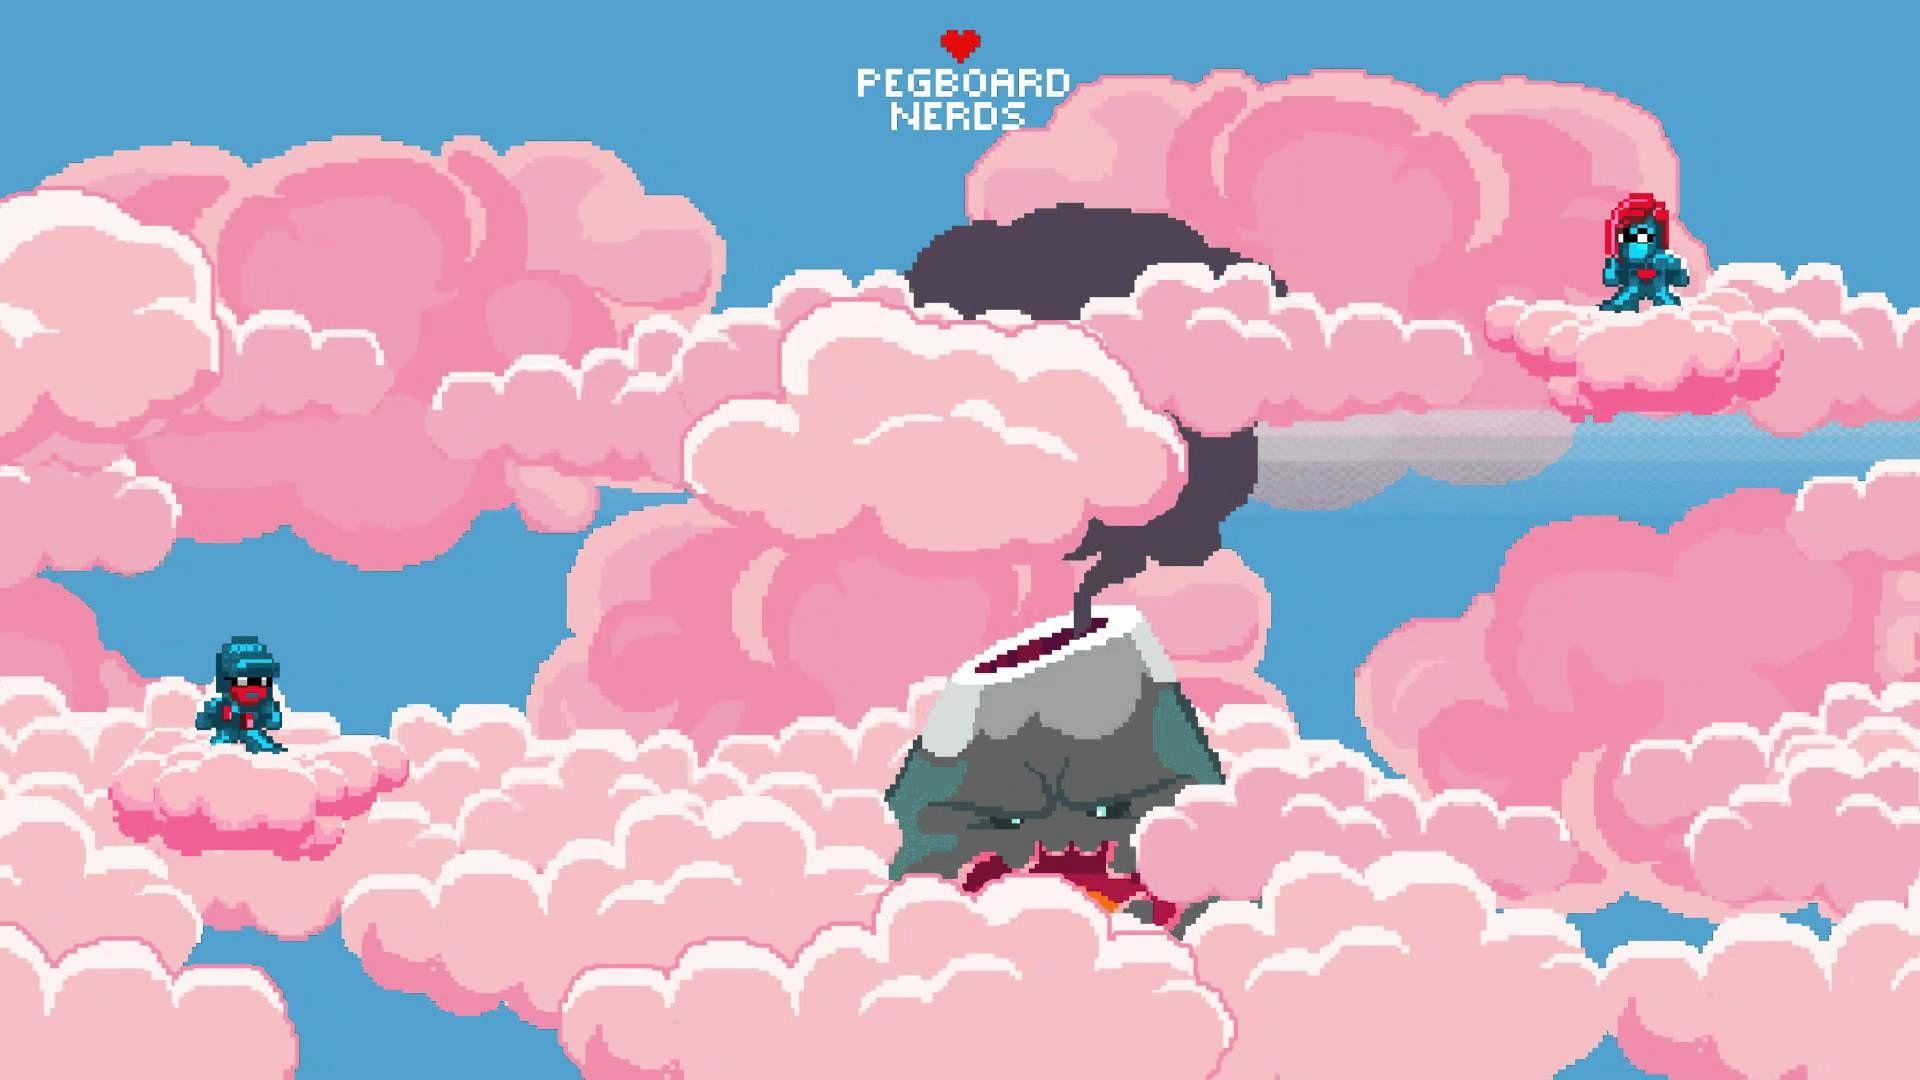 Pegboard Nerds Pink Cloud Wallpaper